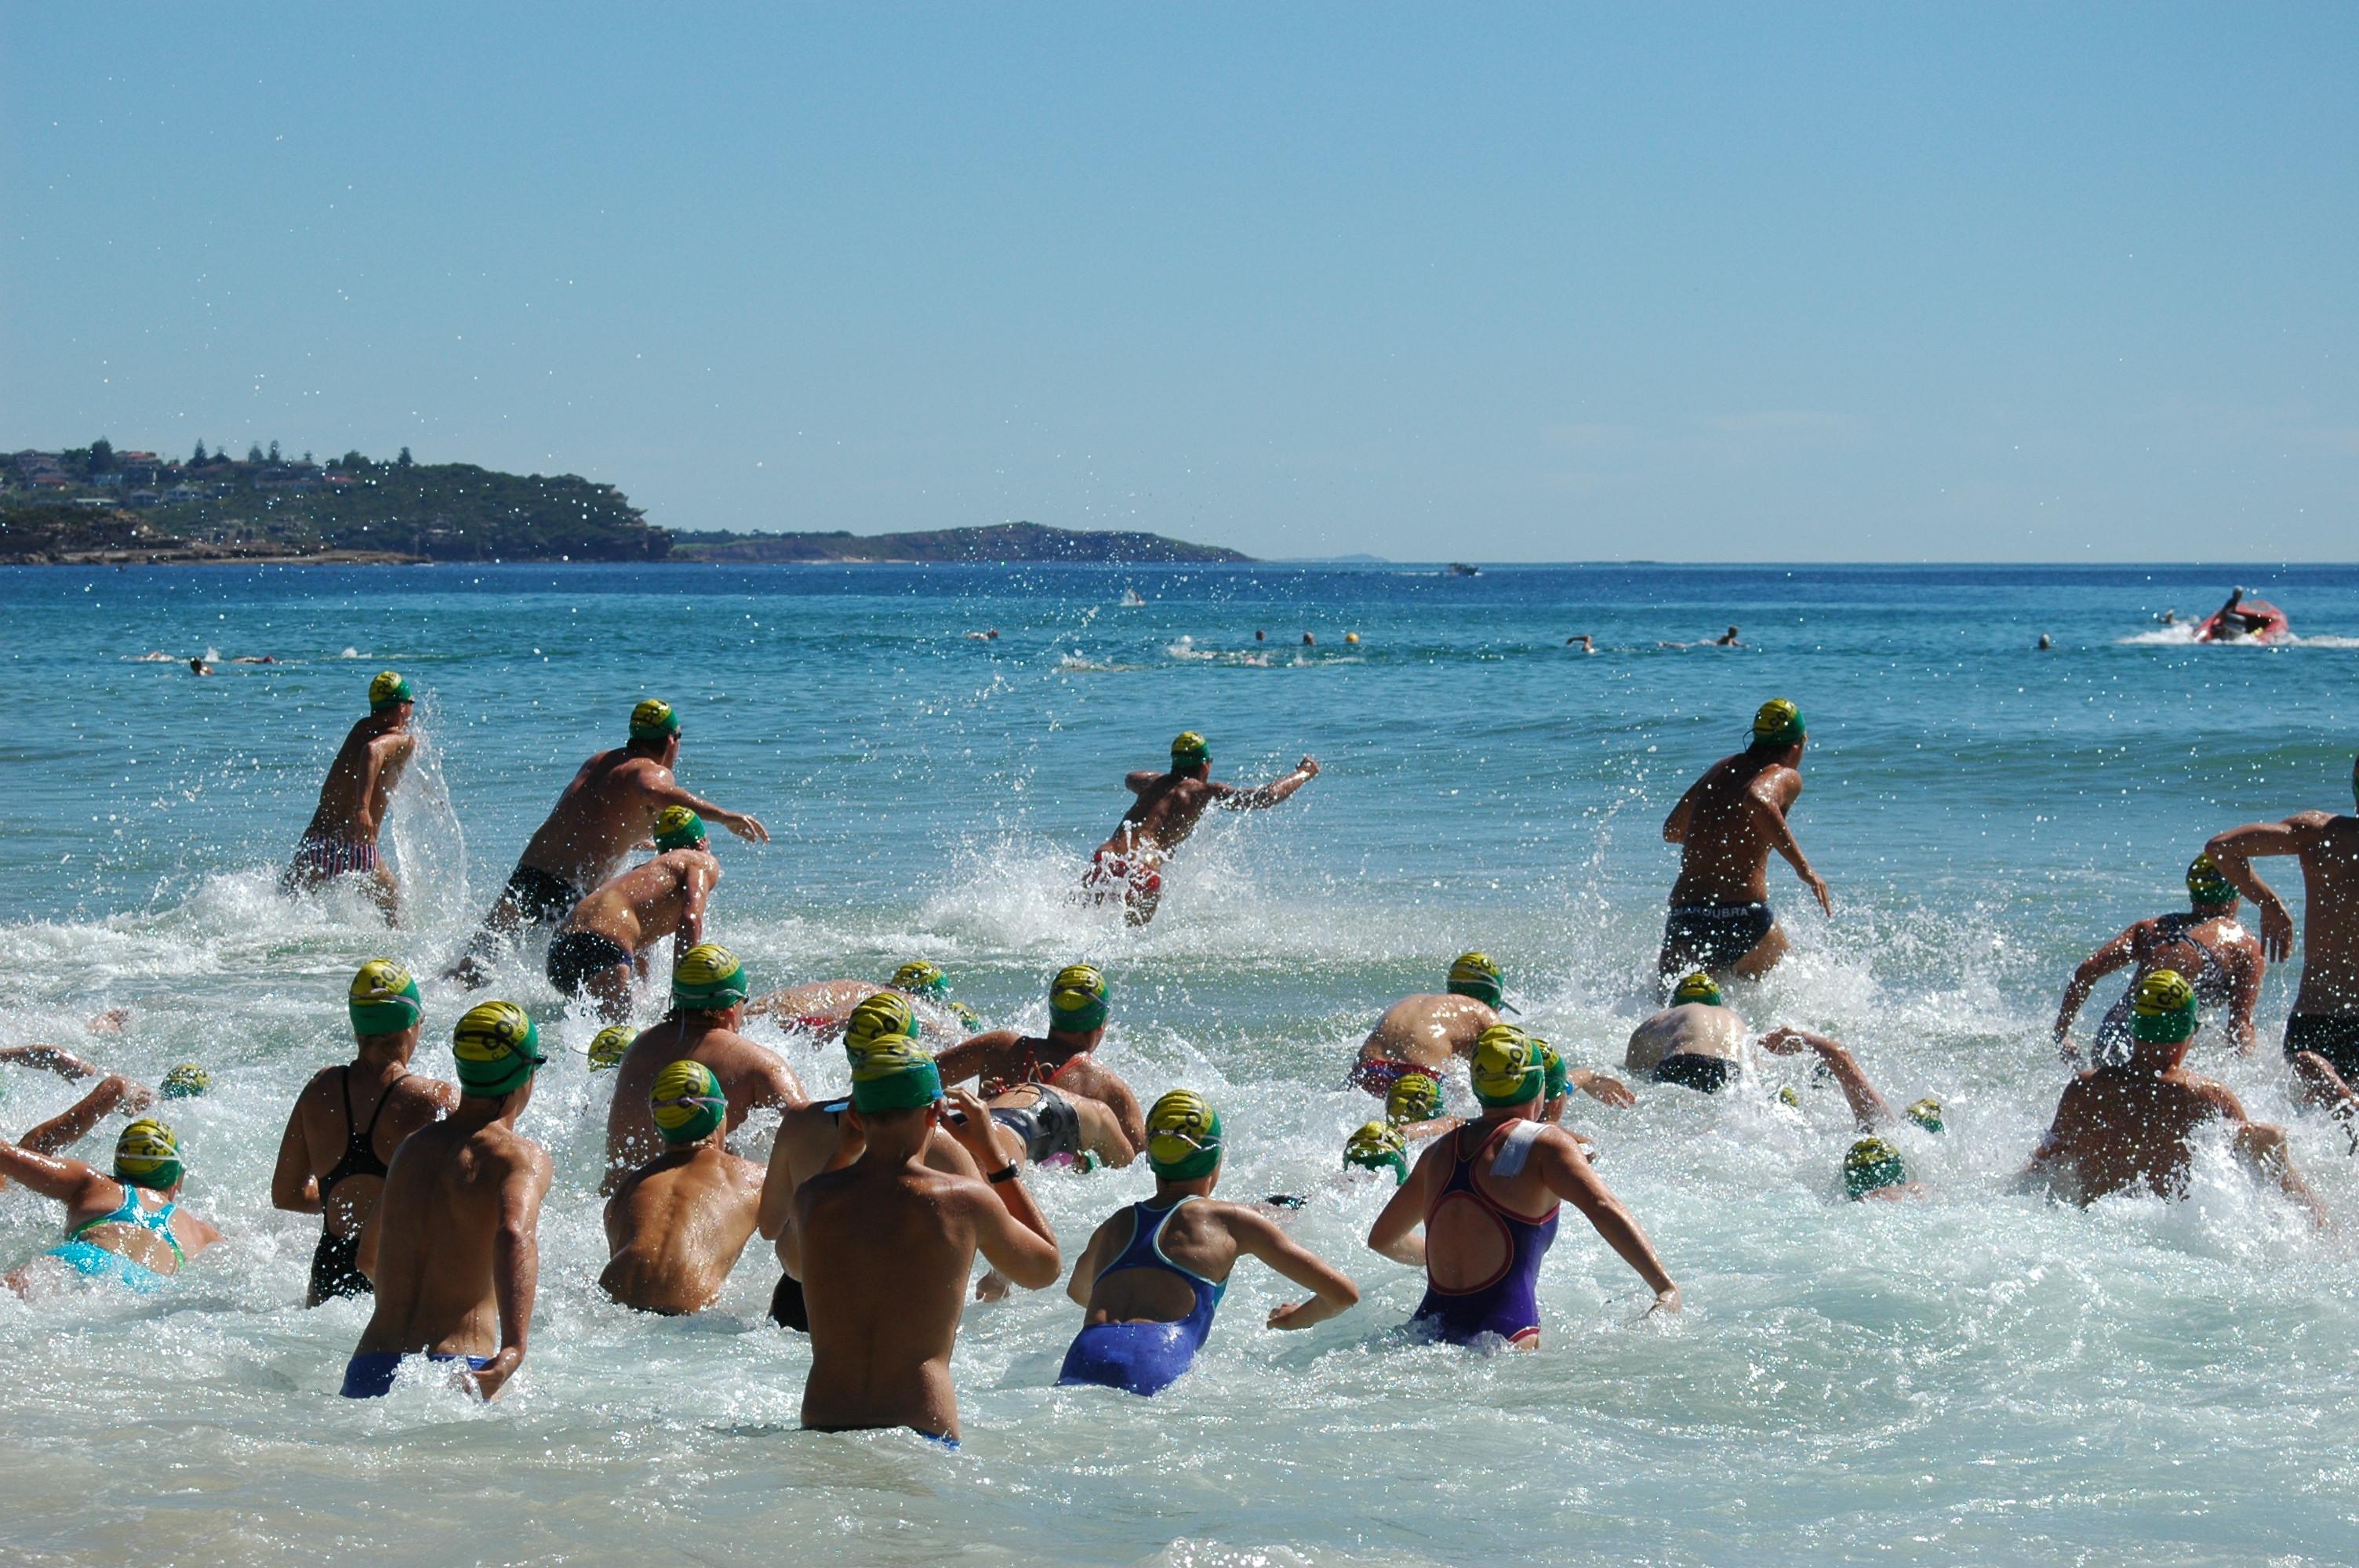 Surf swimming June 20